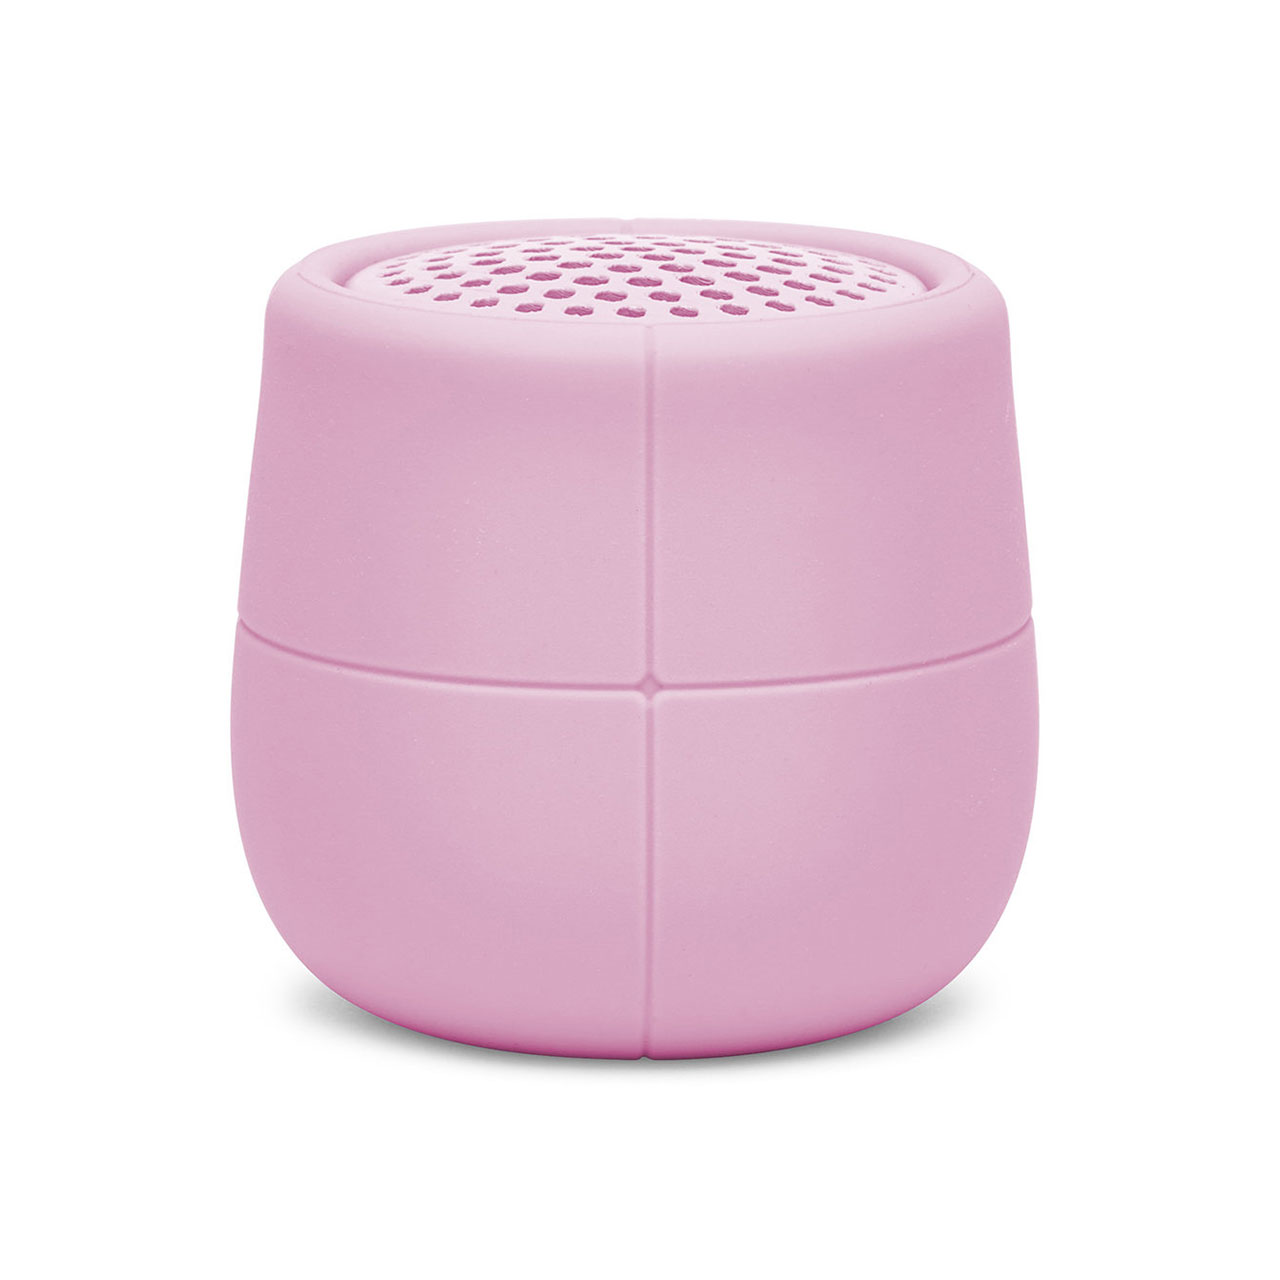 LEXON Mino X Speaker LA120P9 Pink | the design gift shop